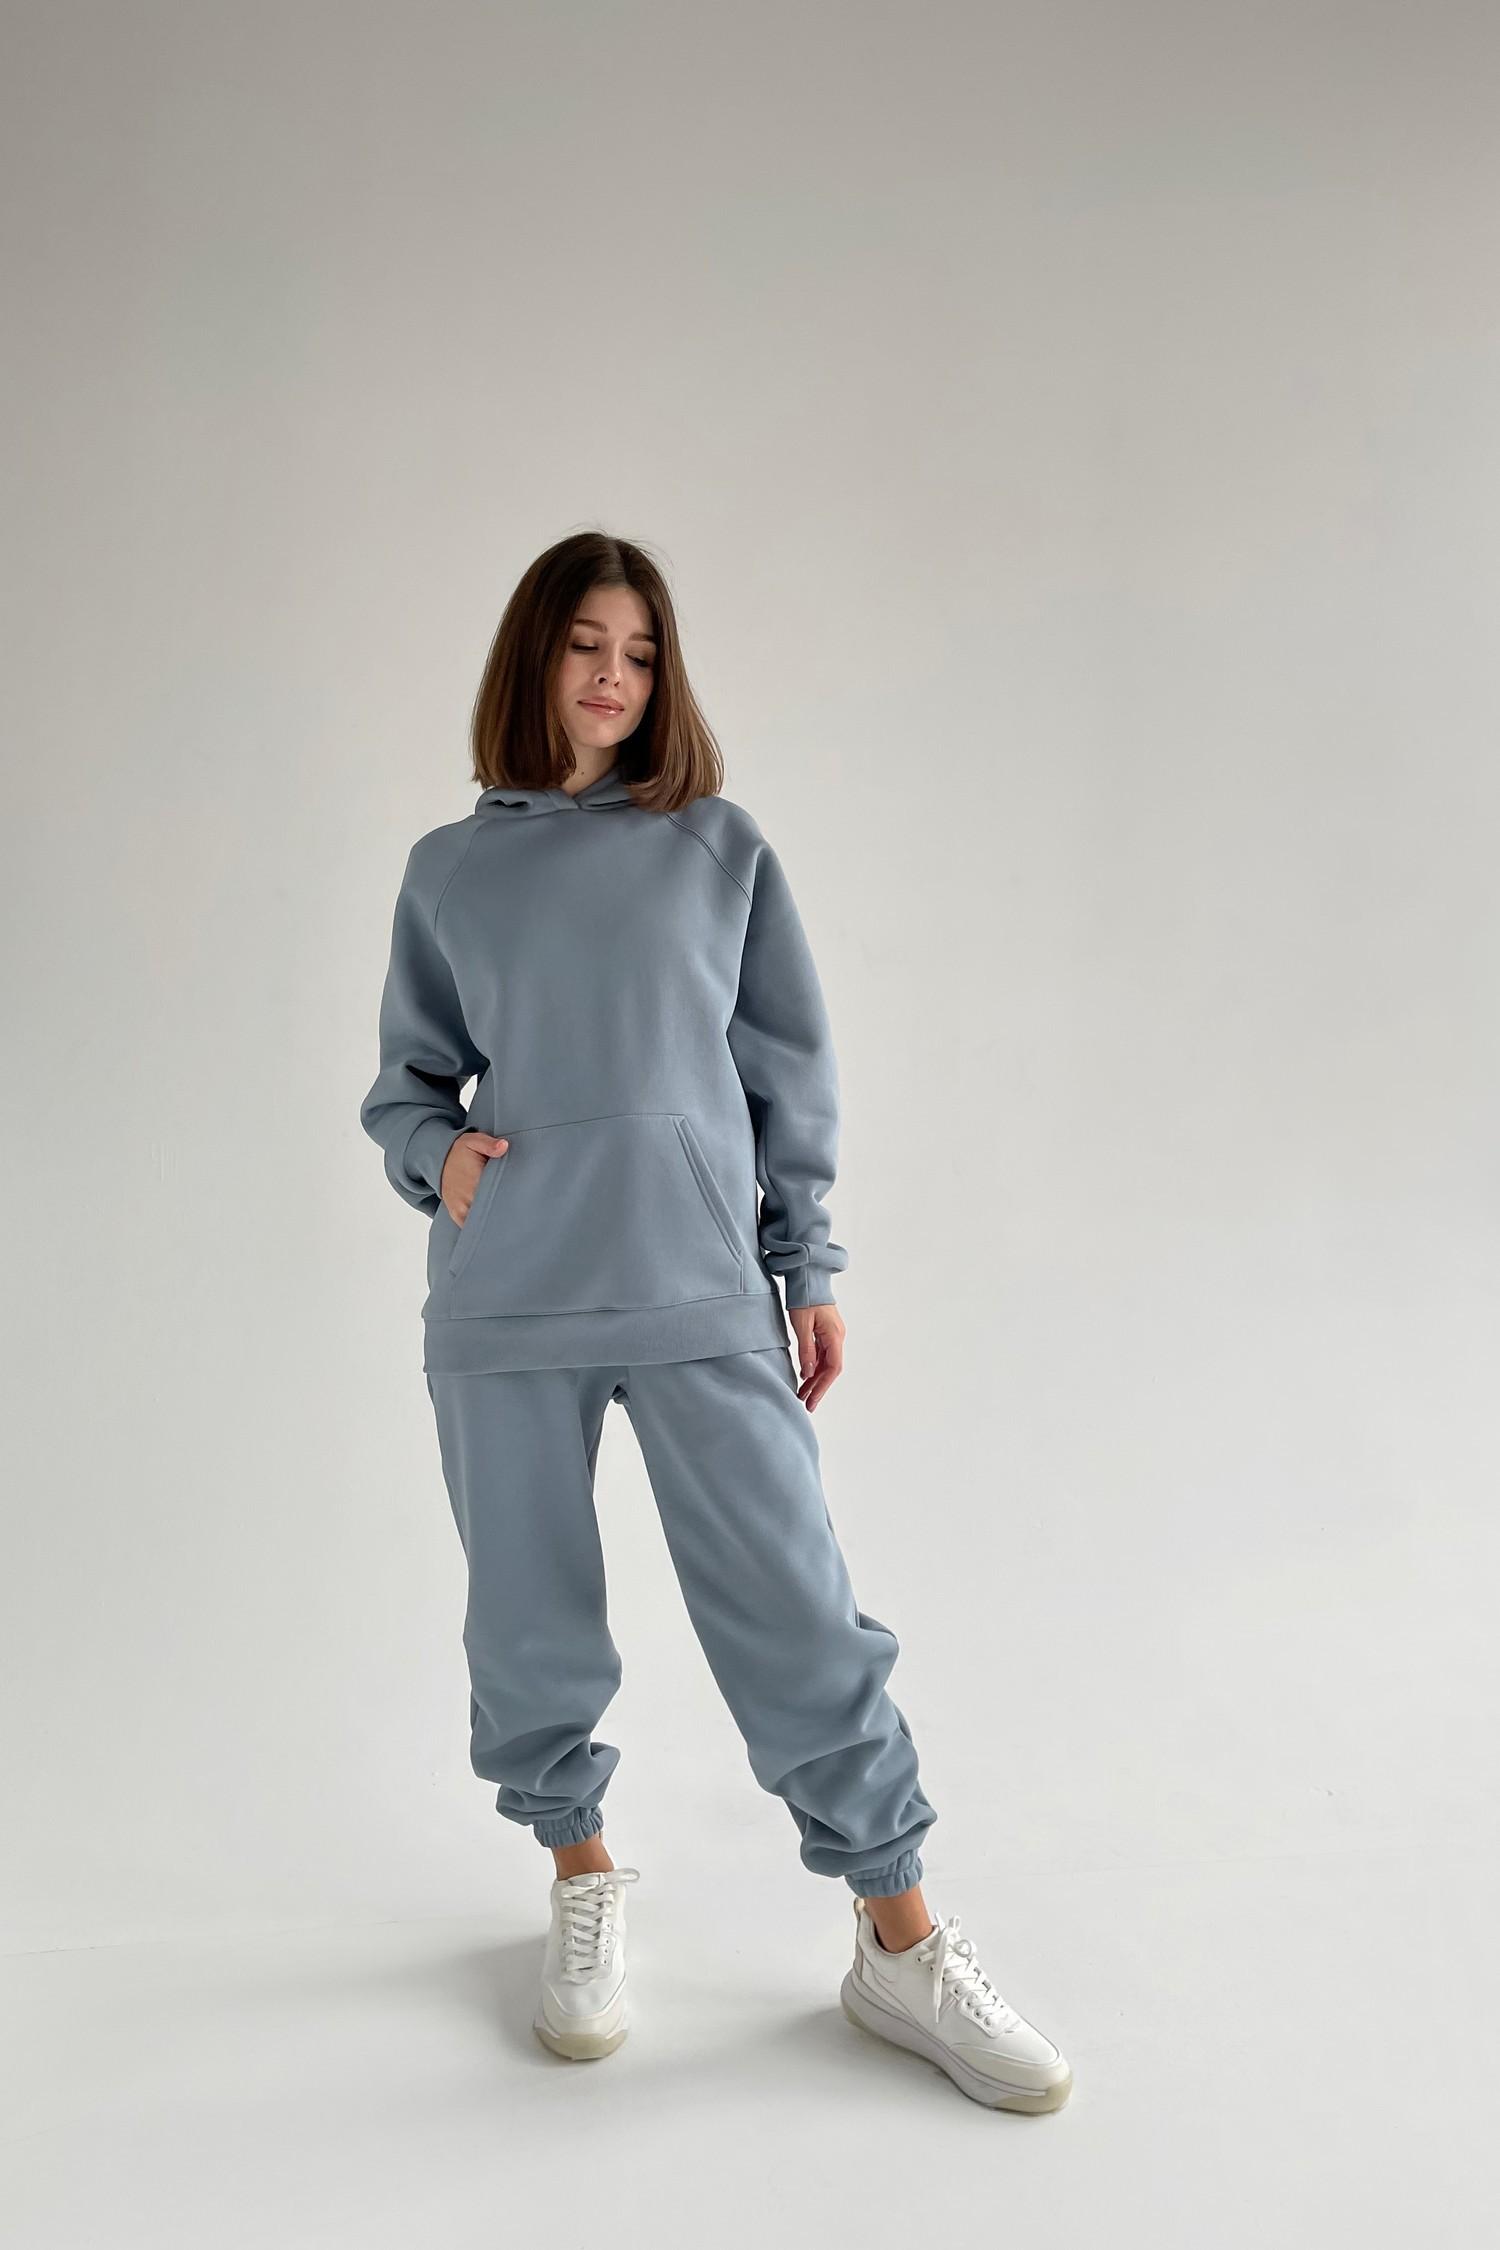 Костюм со спортивными брюками и худи arctic - THE LACE